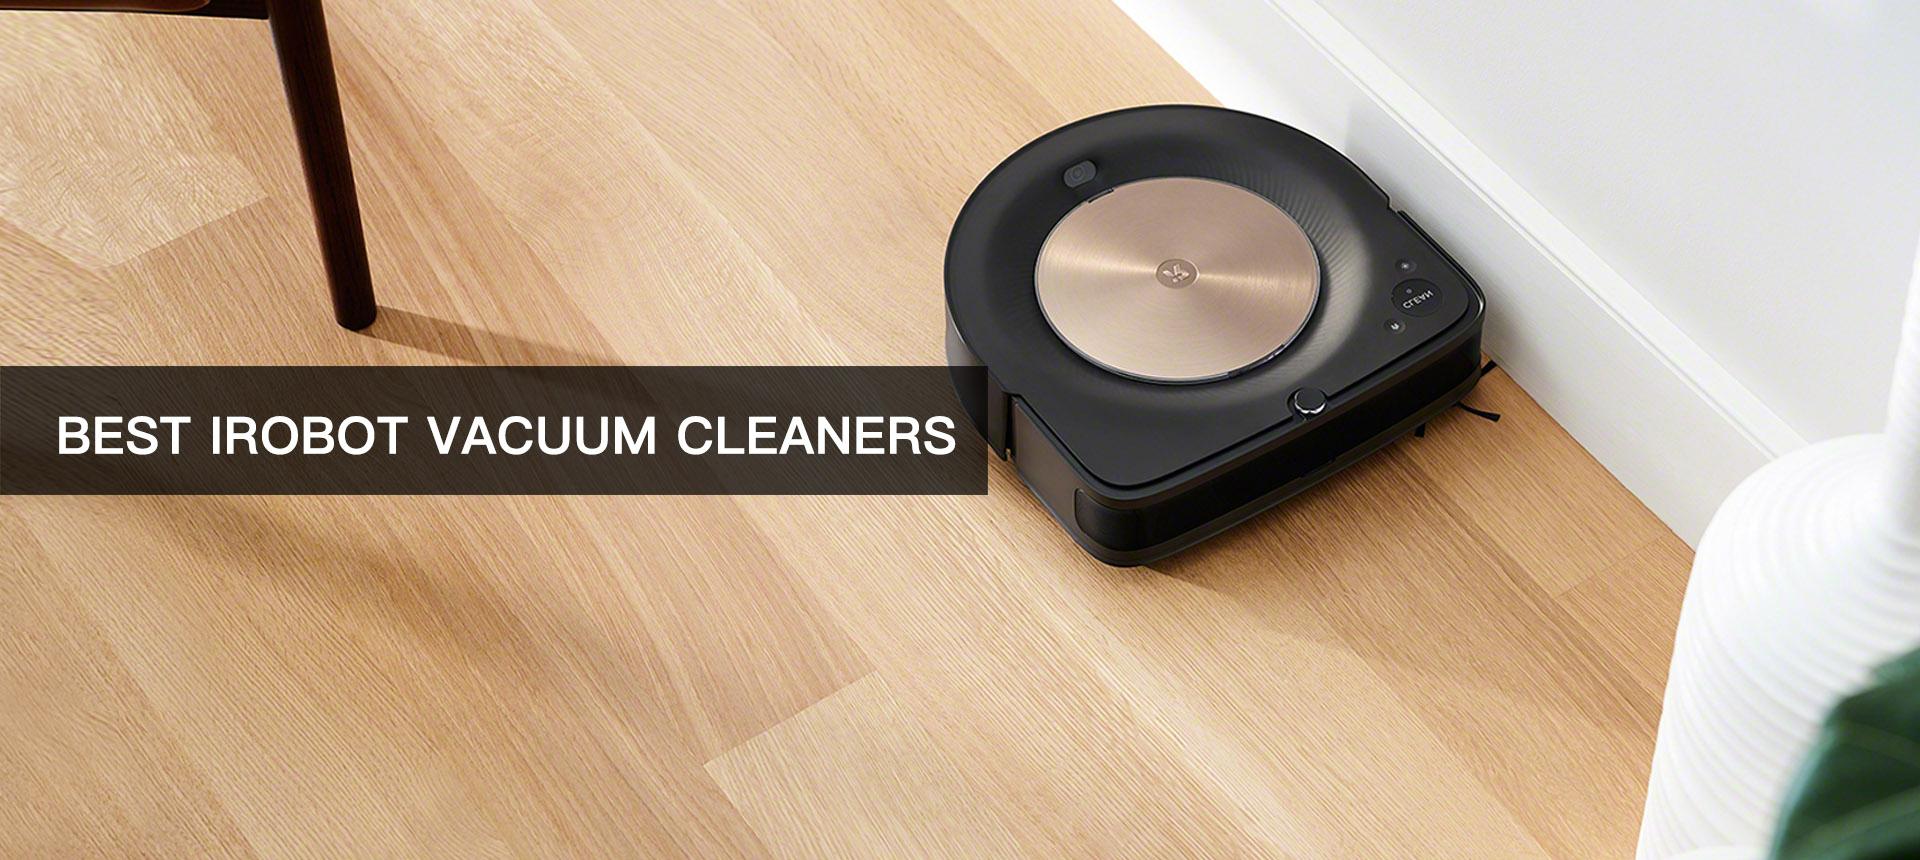 Best iRobot Vacuum Cleaners